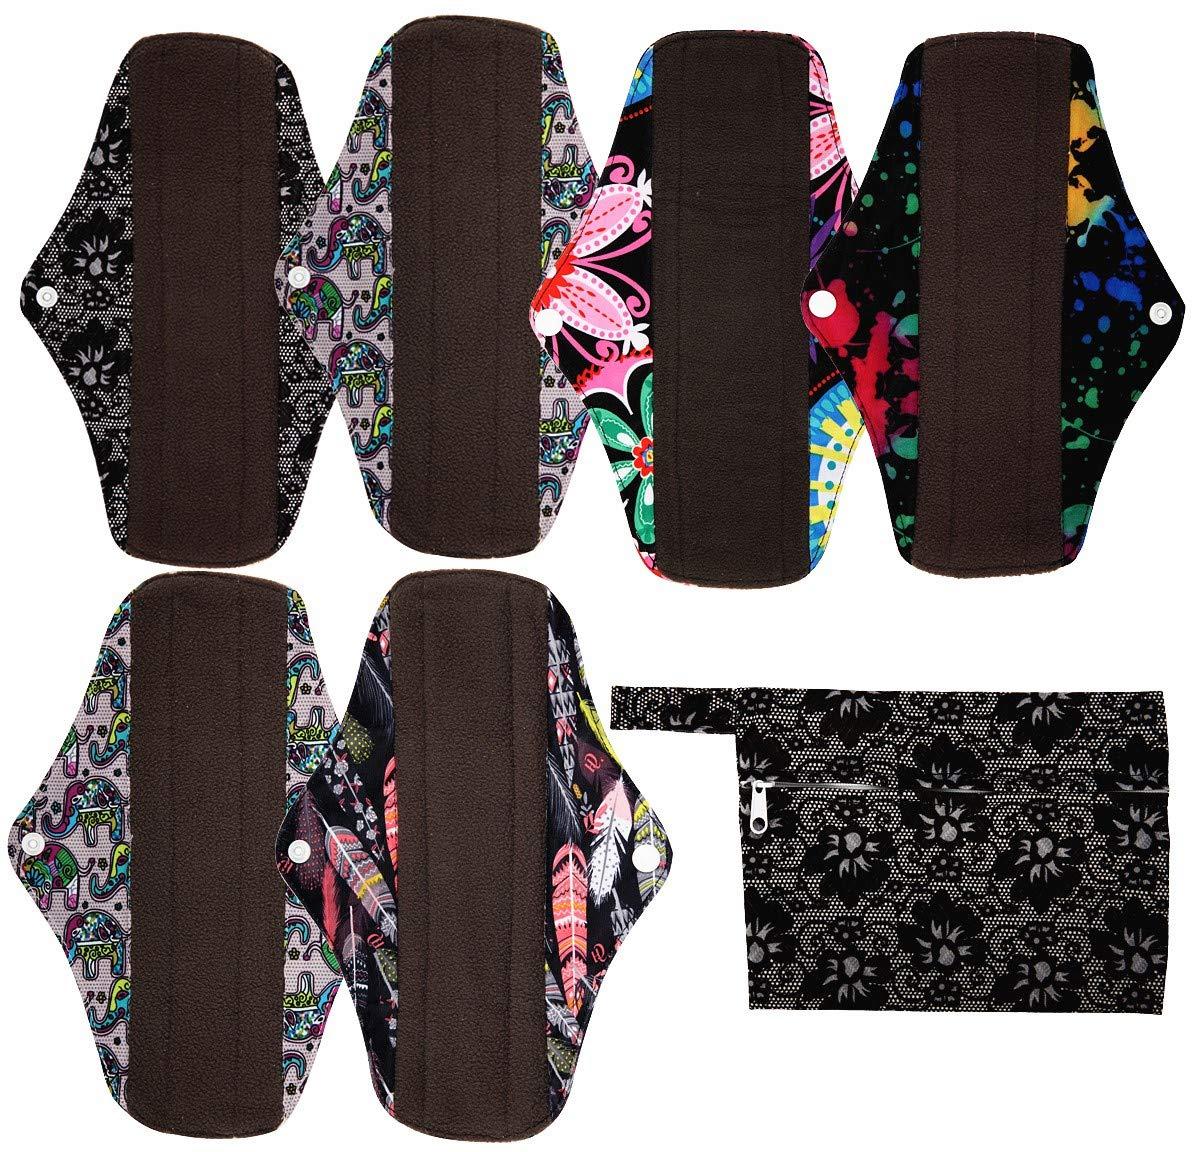 7pcs Set 1pc Mini Wet Bag +6pcs 10 Inch Regular Charcoal Bamboo Mama Cloth/ Menstrual Pads/ Reusable Sanitary Pads (Black) by Hibaby